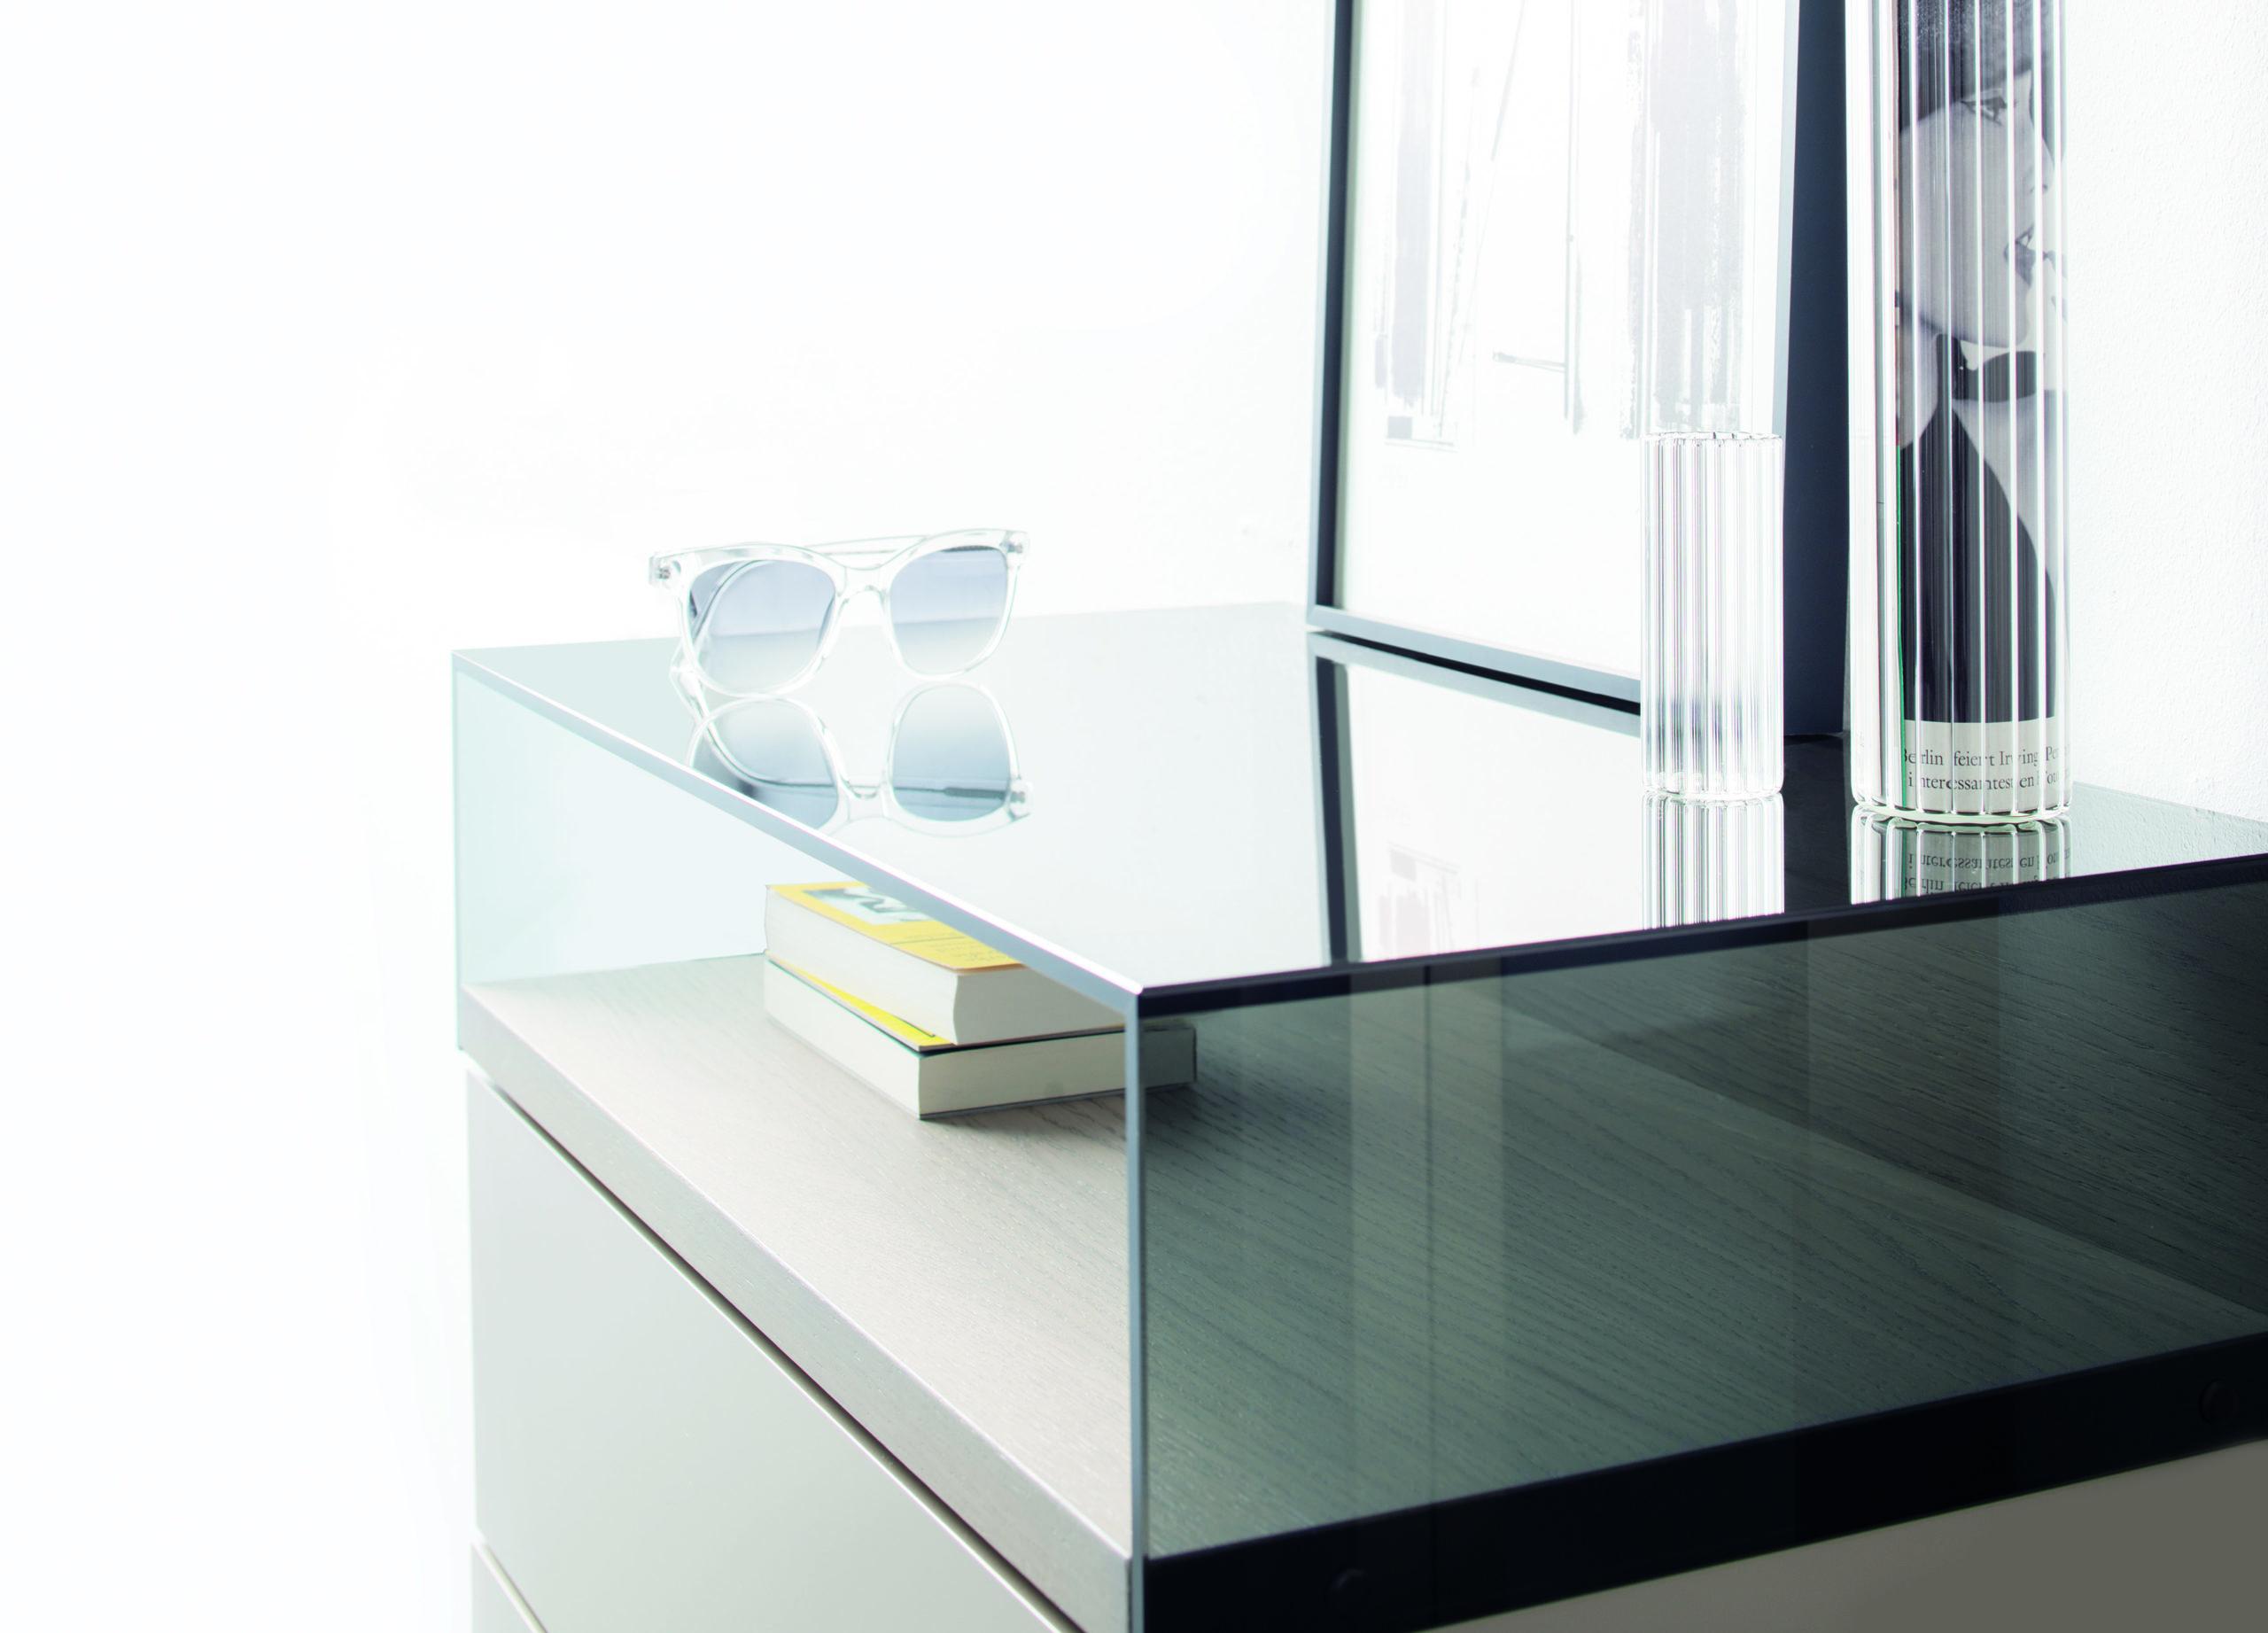 Sudbrock KAYA Garderobe 1 - Glasaufsatz in Rauchglas. Abdeckblatt Eiche Sahara.